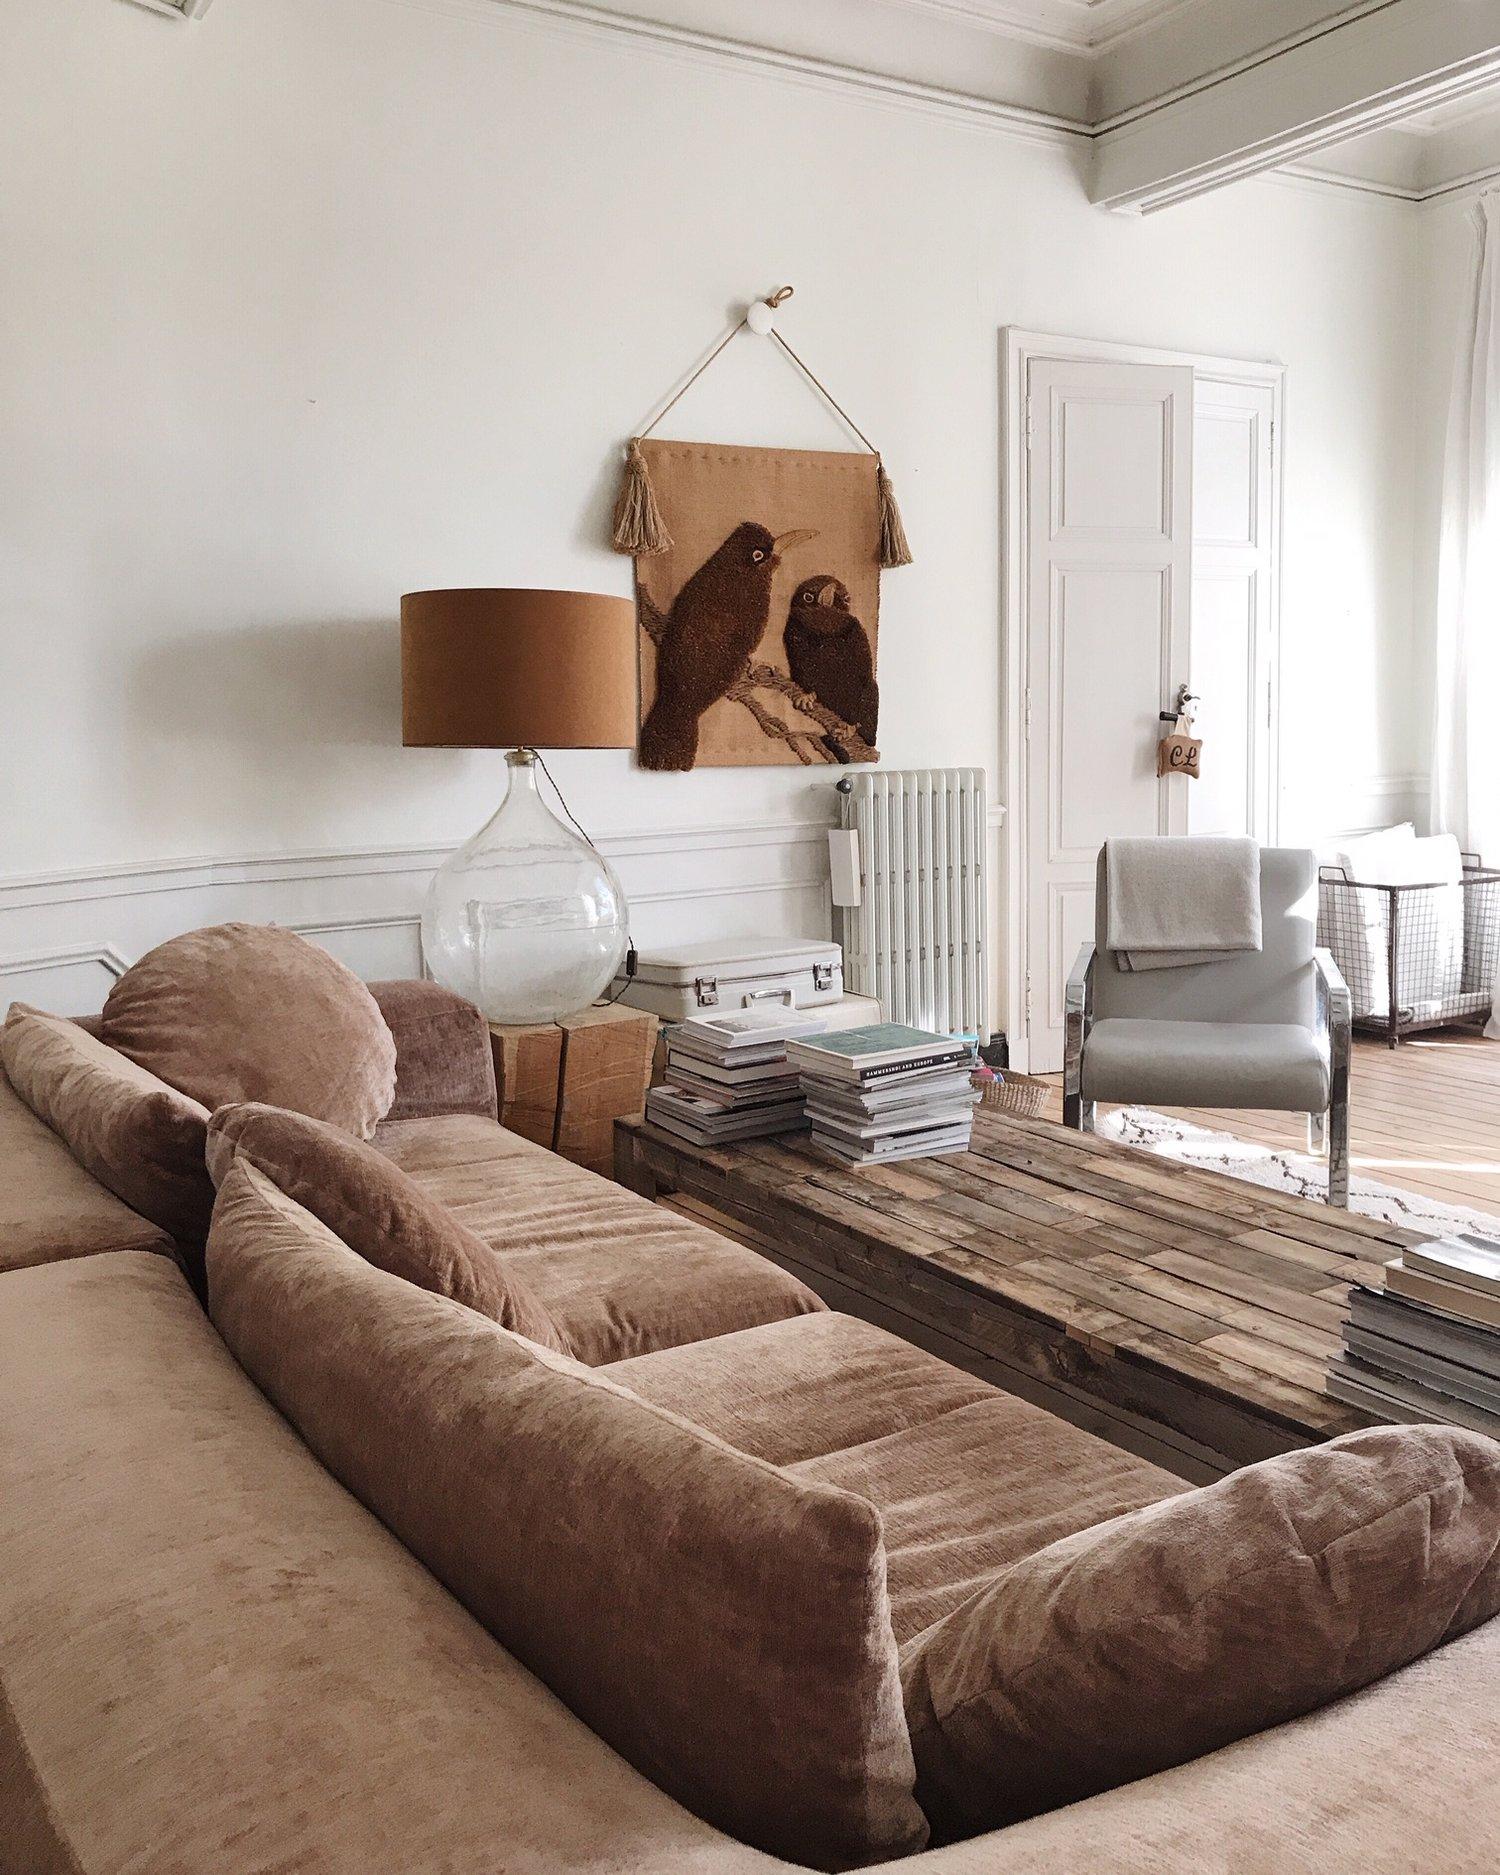 camellas-lloret-maison-d'hotes-lounge-view-rose-couch.jpg